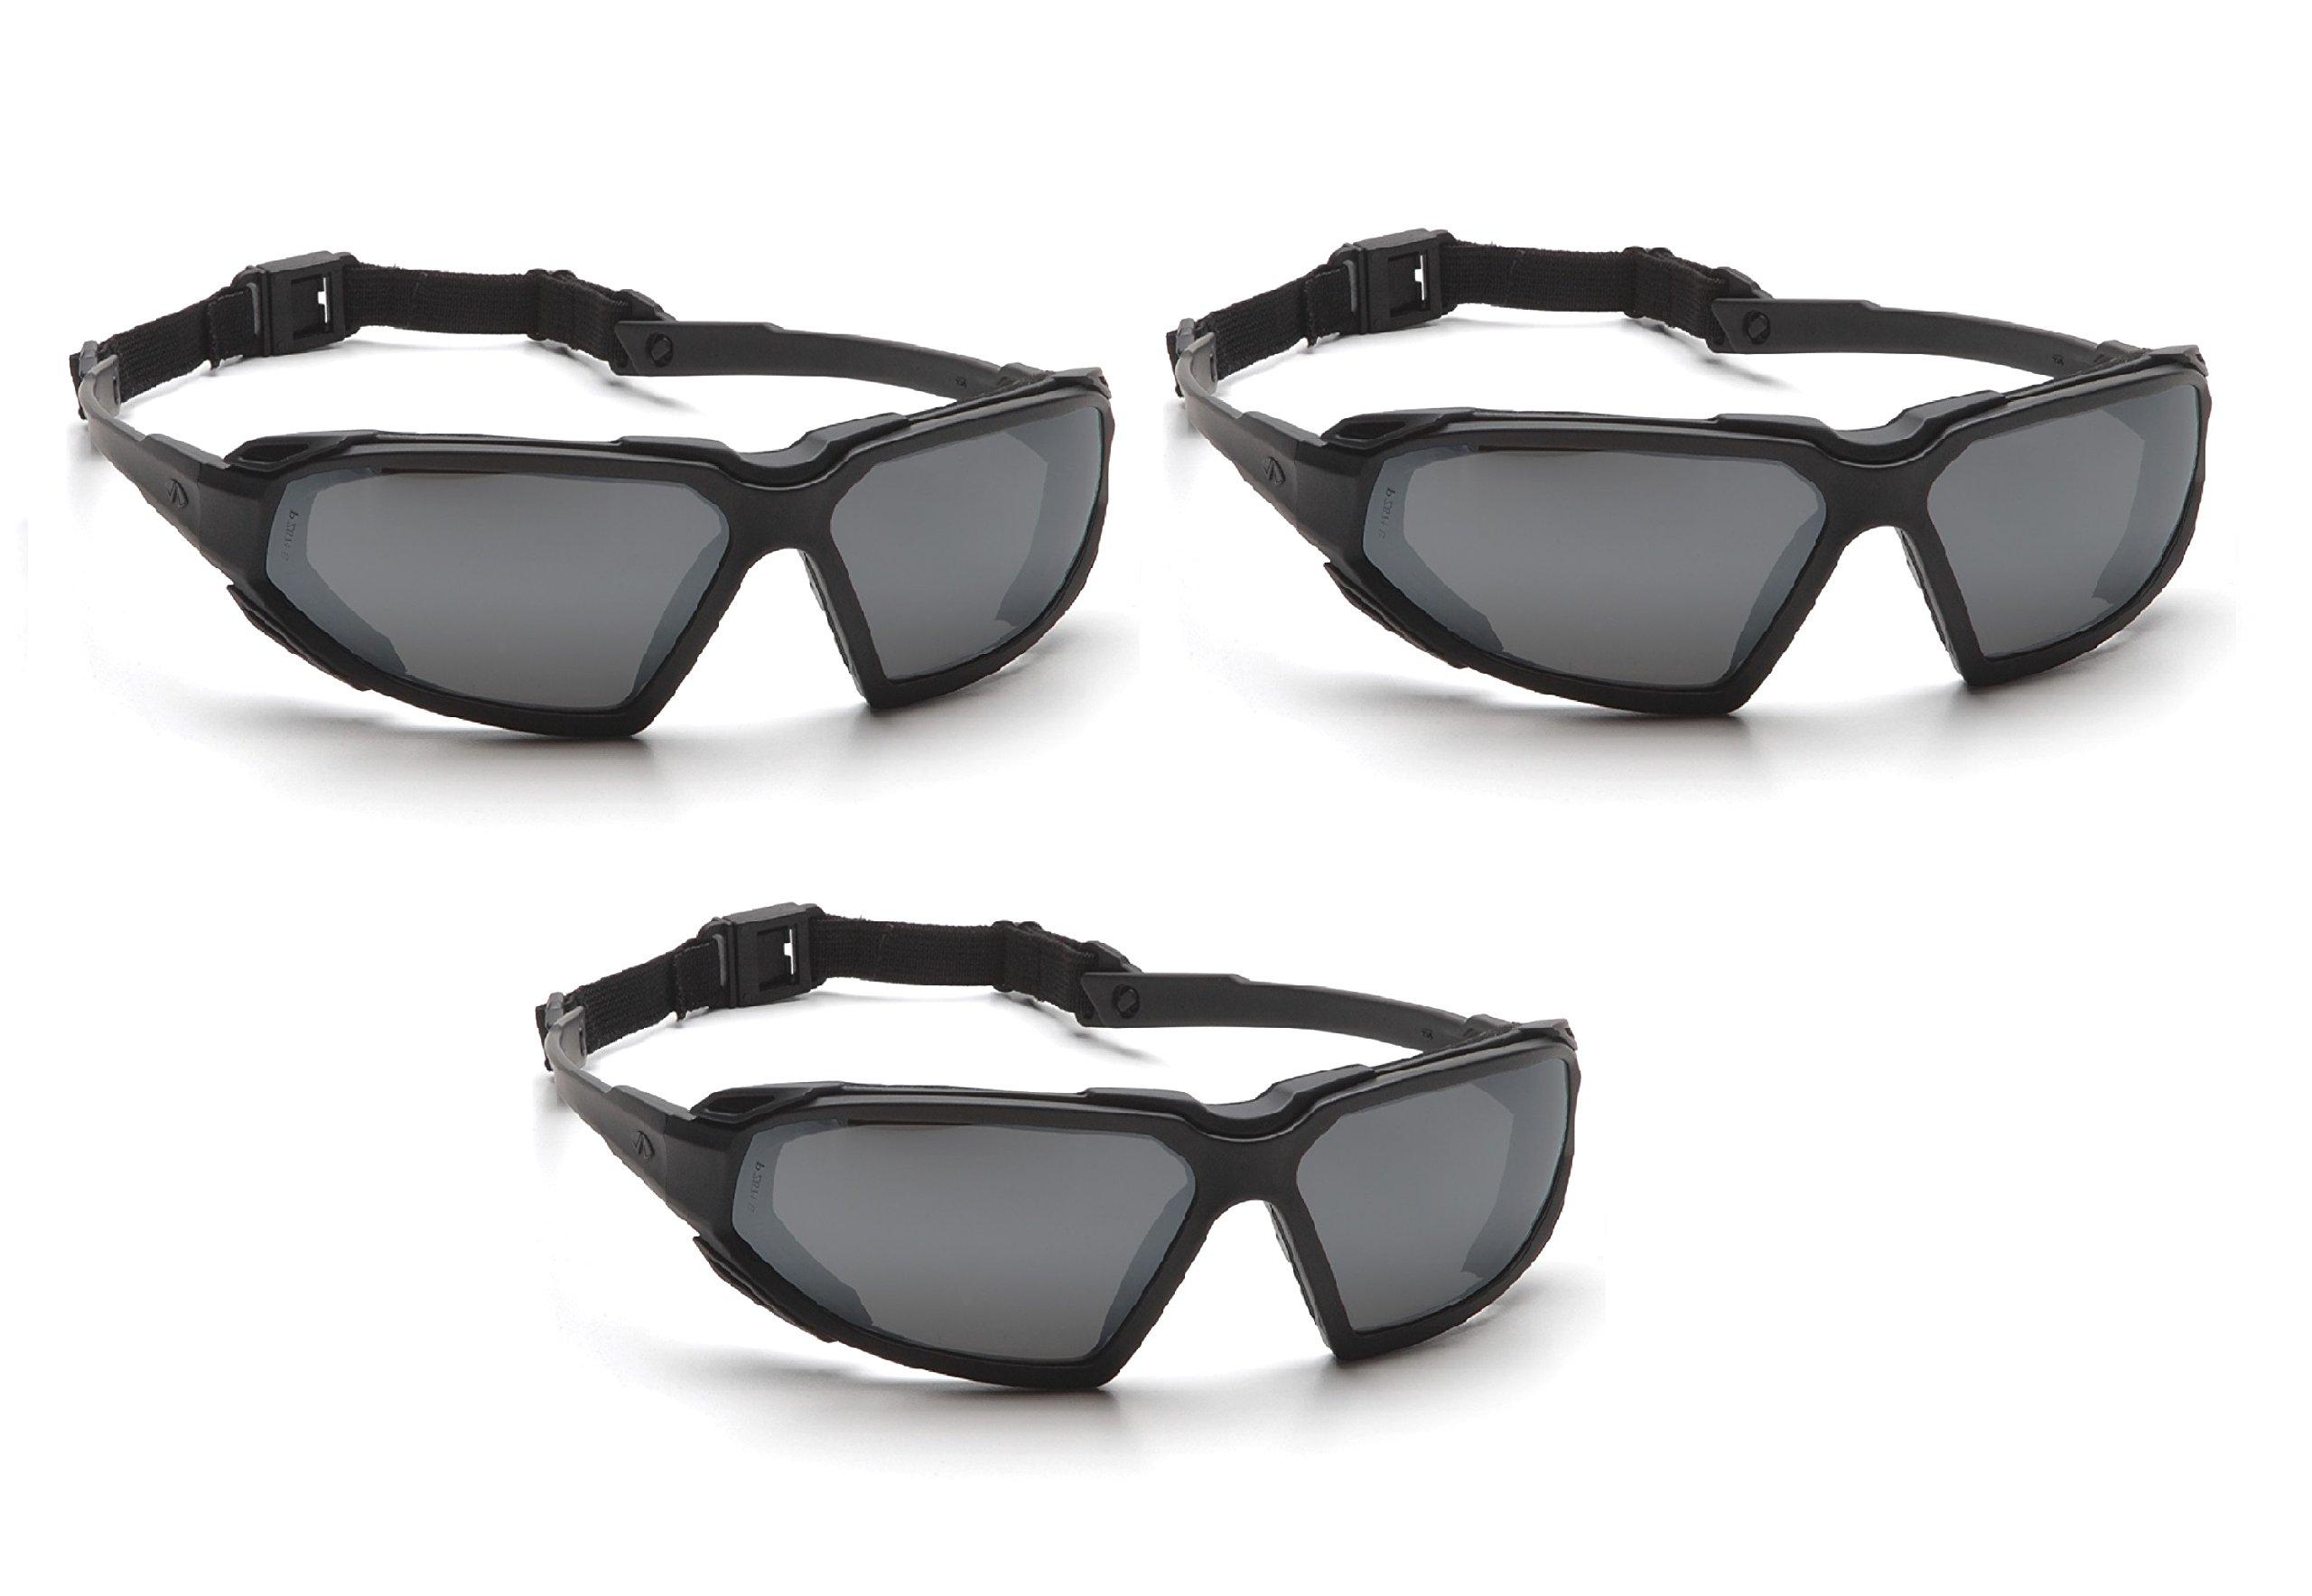 Highlander Pyramex Safety Eyewear (Black Frame/Gray Anti-Fog Lens) (3 Pair Pack) by Highlander